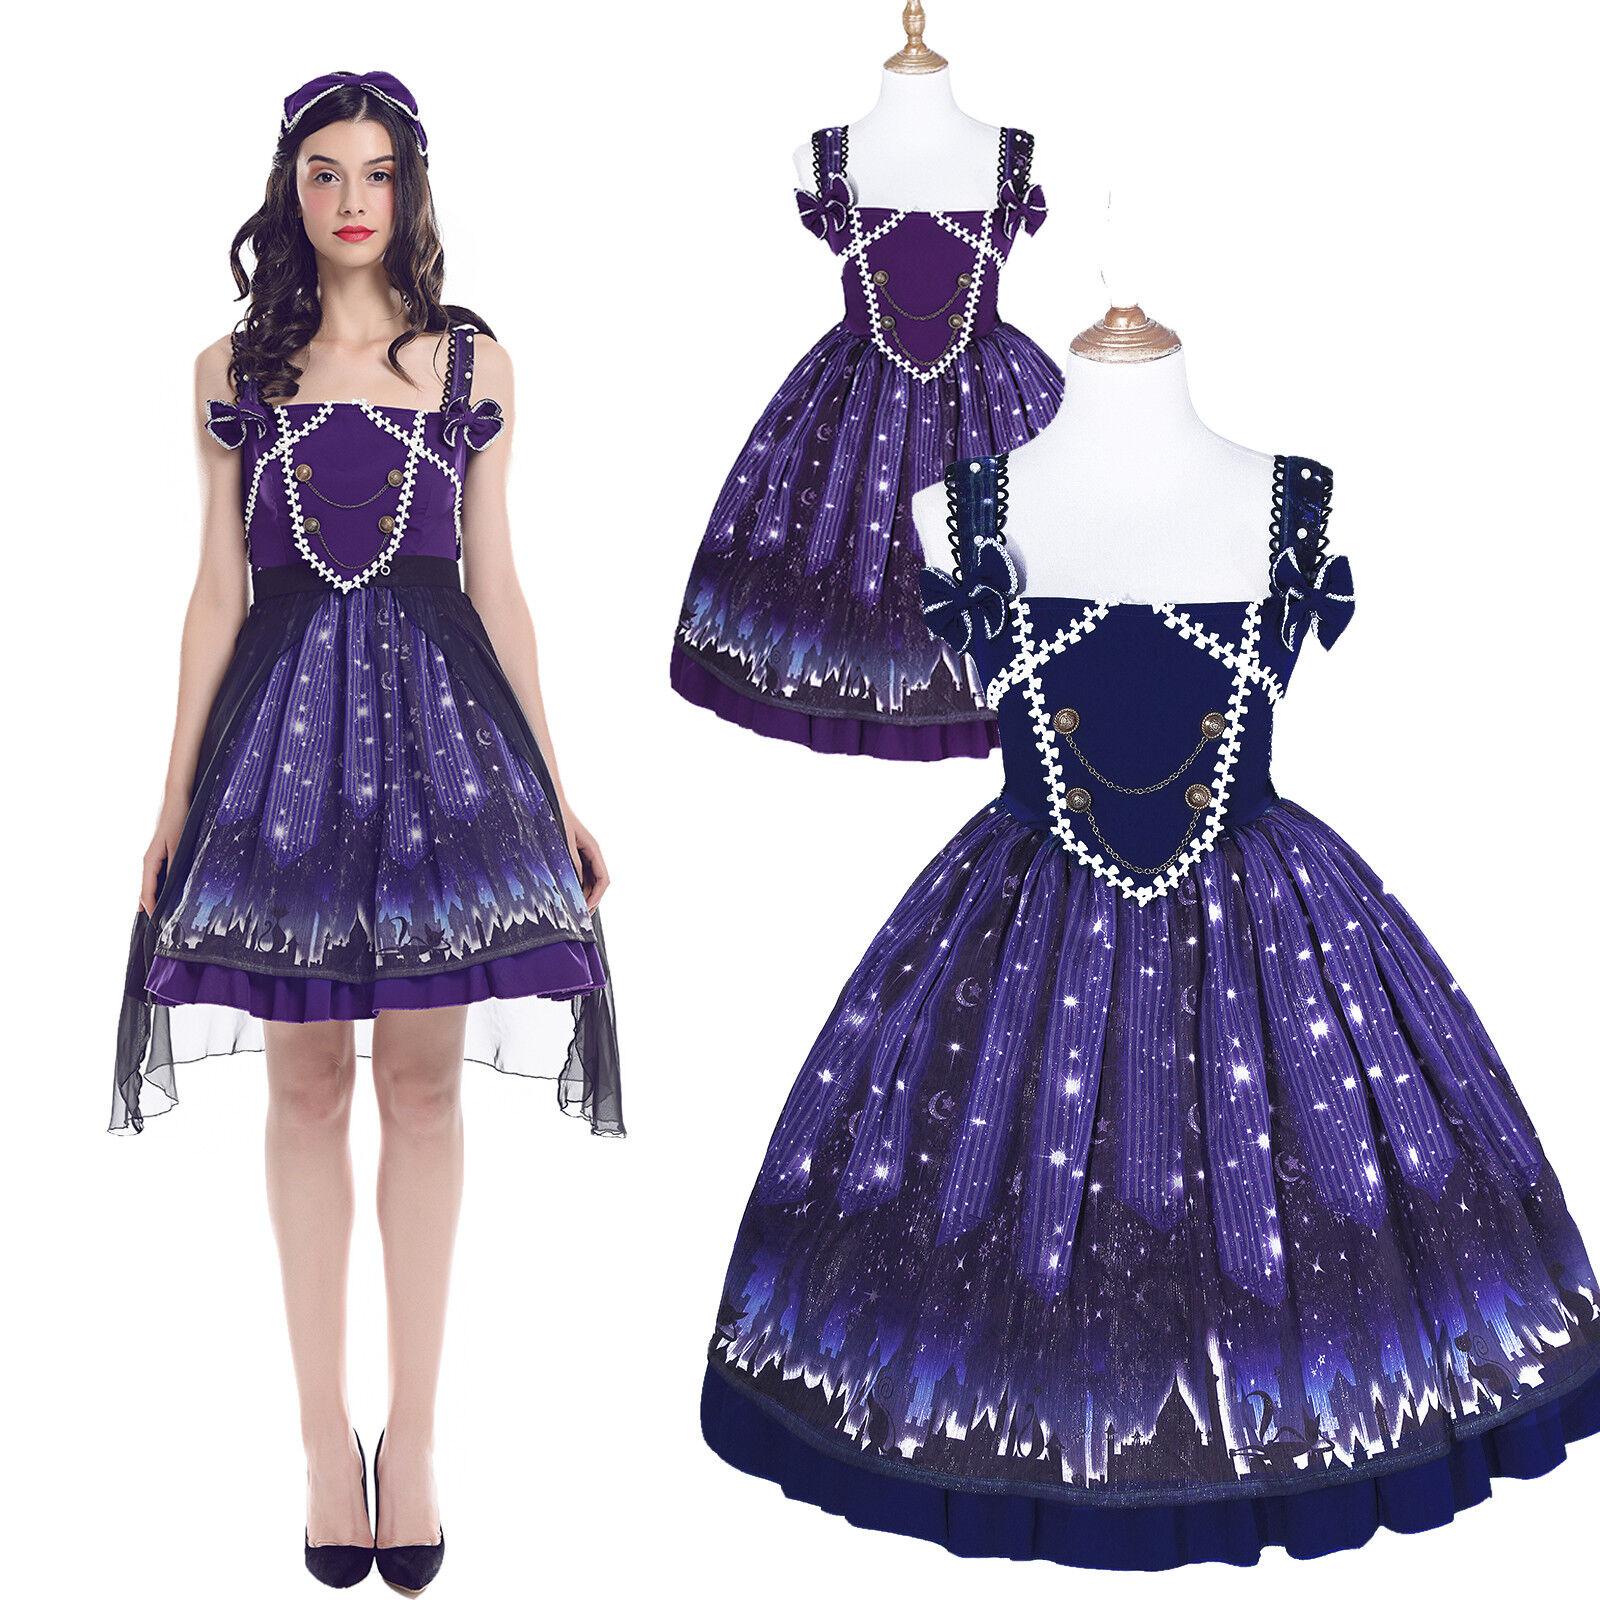 Starry Sky Printed Strap Skirt Bowknot Sleeveless JSK Princess Lolita Dress Gift